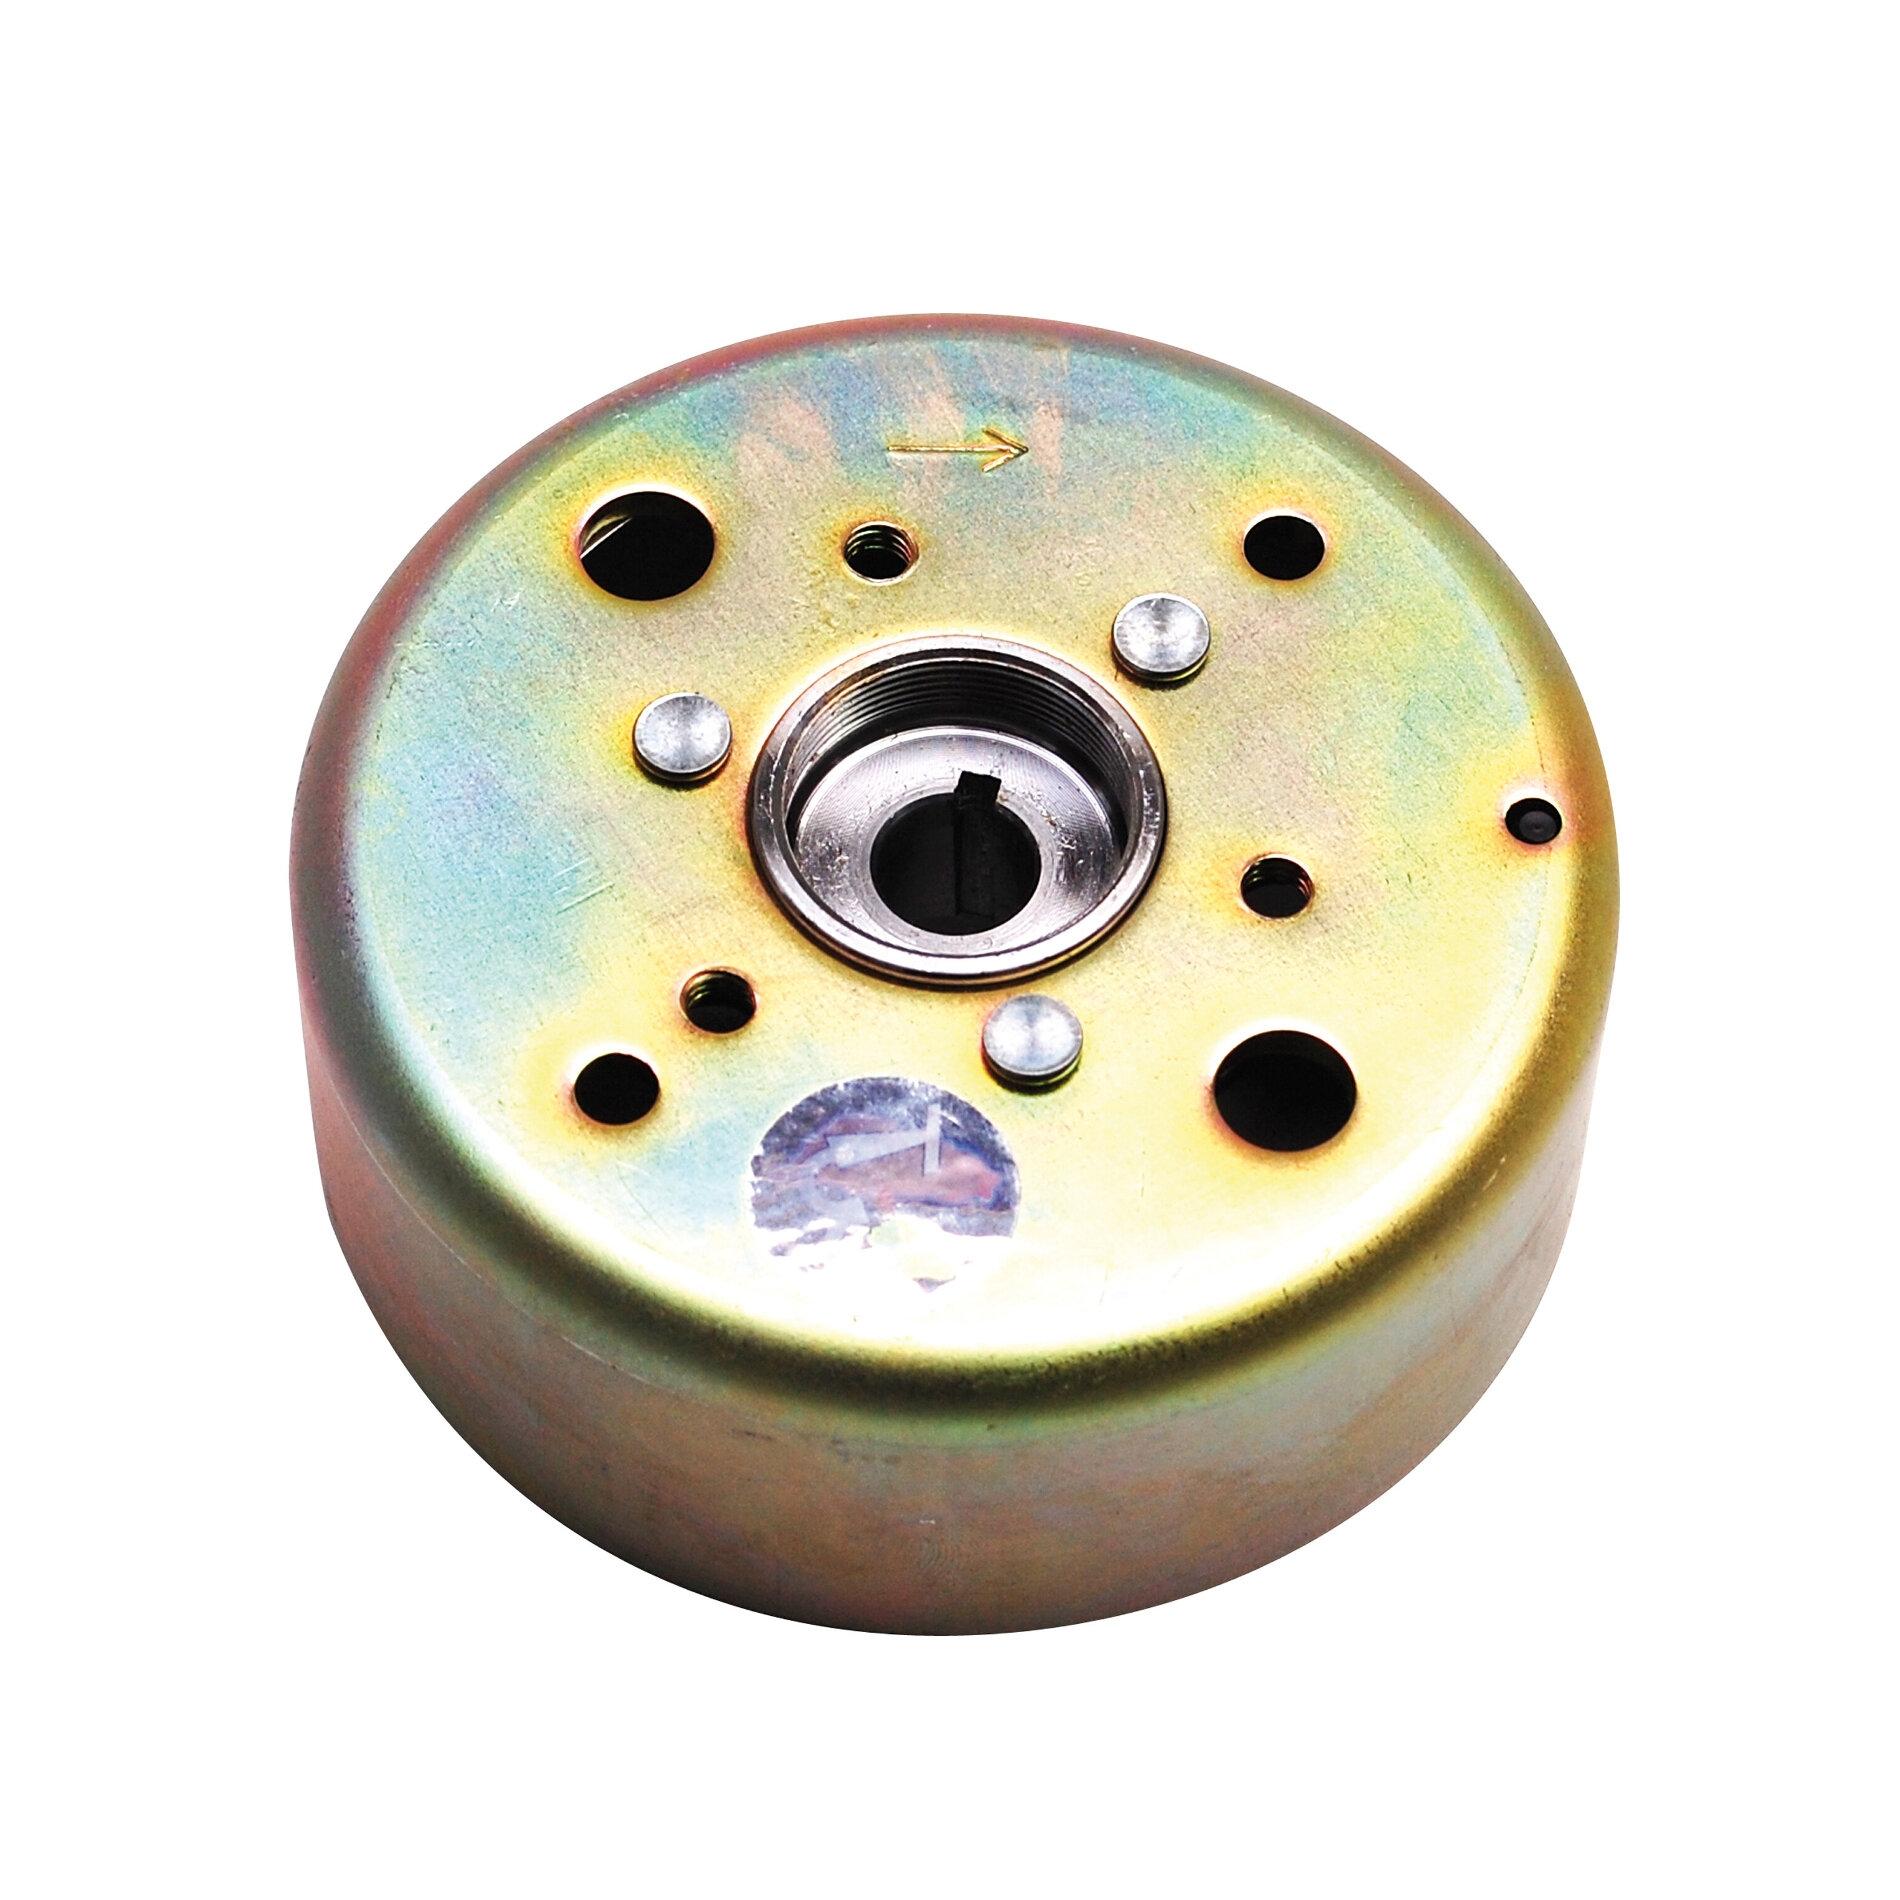 Rotor d'allumage adaptable Booster spirit/Nitro/BW's original/Aerox >2